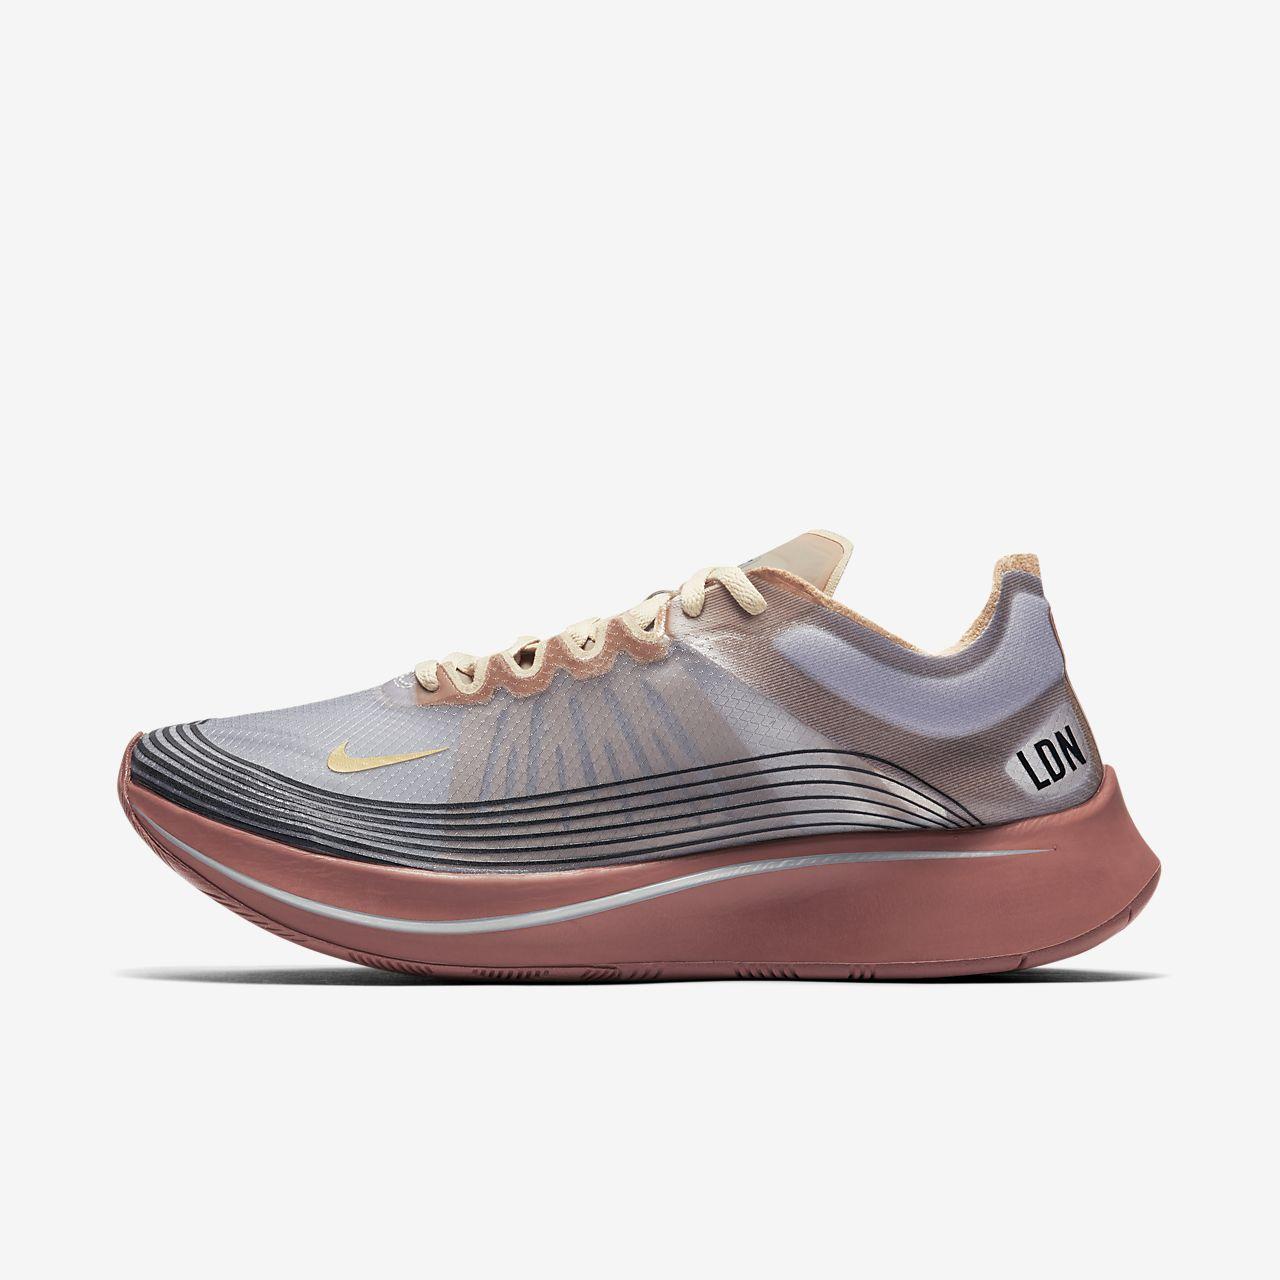 save off 309cd fe947 ... Buty do biegania Nike Zoom Fly SP